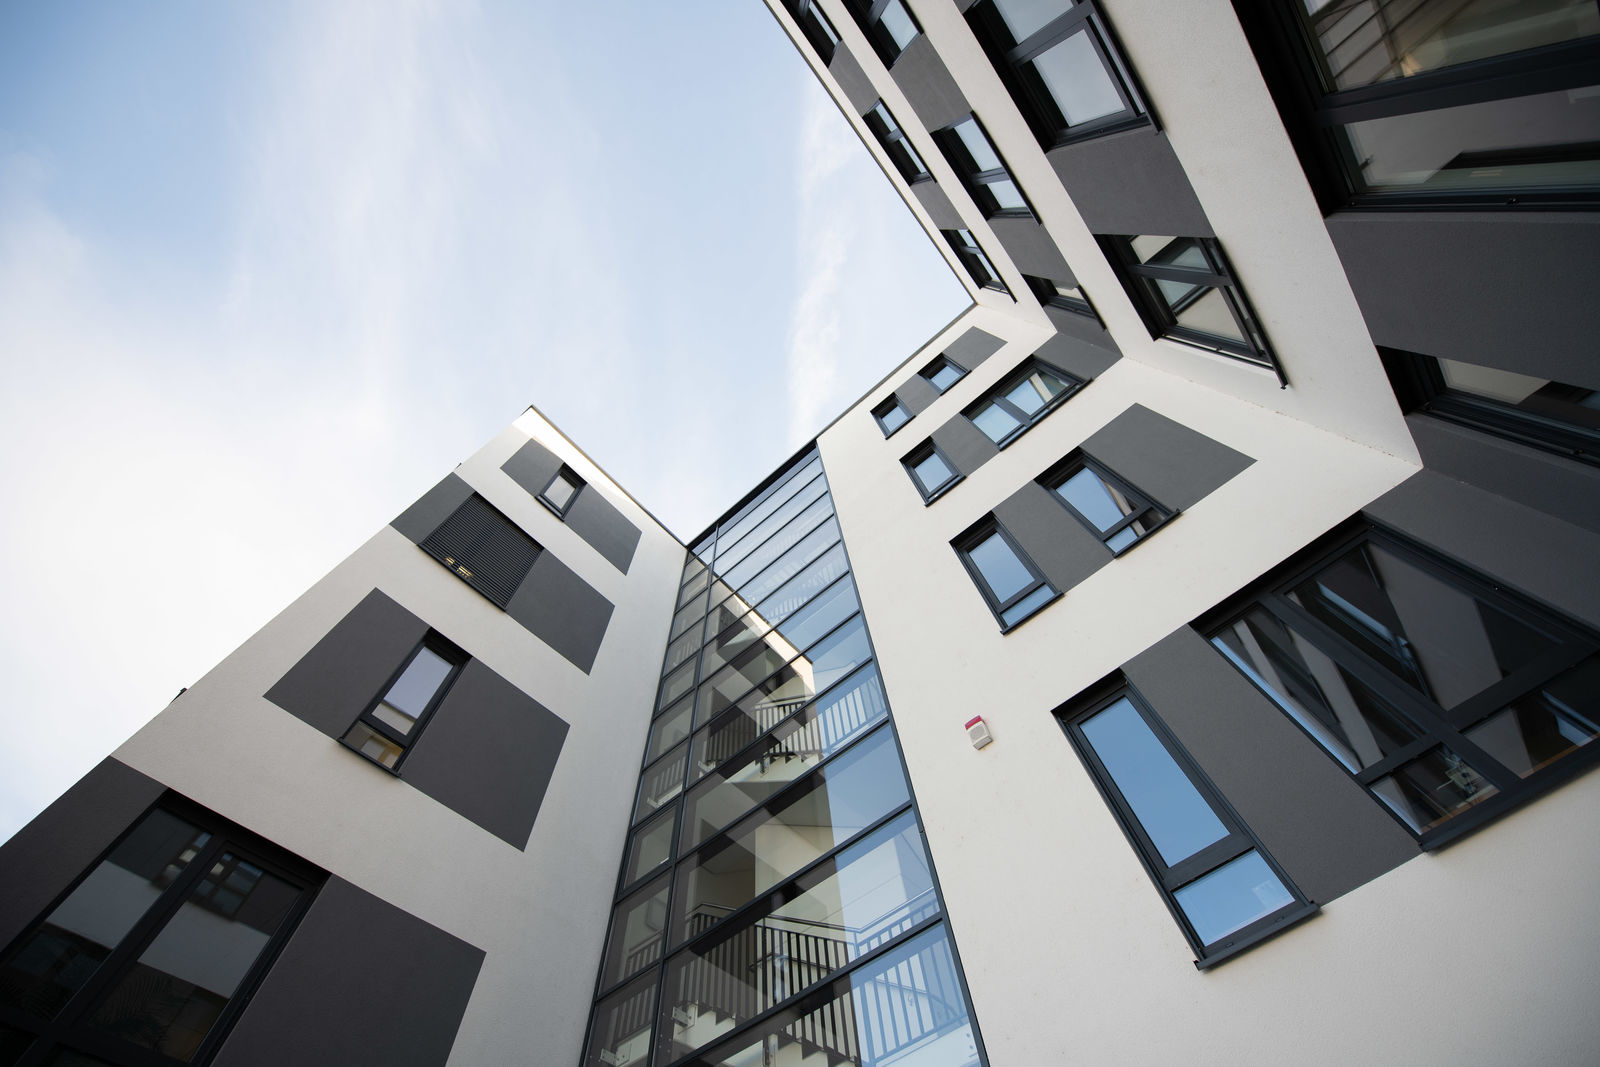 Praktikant/Werkstudent (m/d/w) - Job Koblenz - Karriereportal der Gruppe Dr. Dienst & Partner